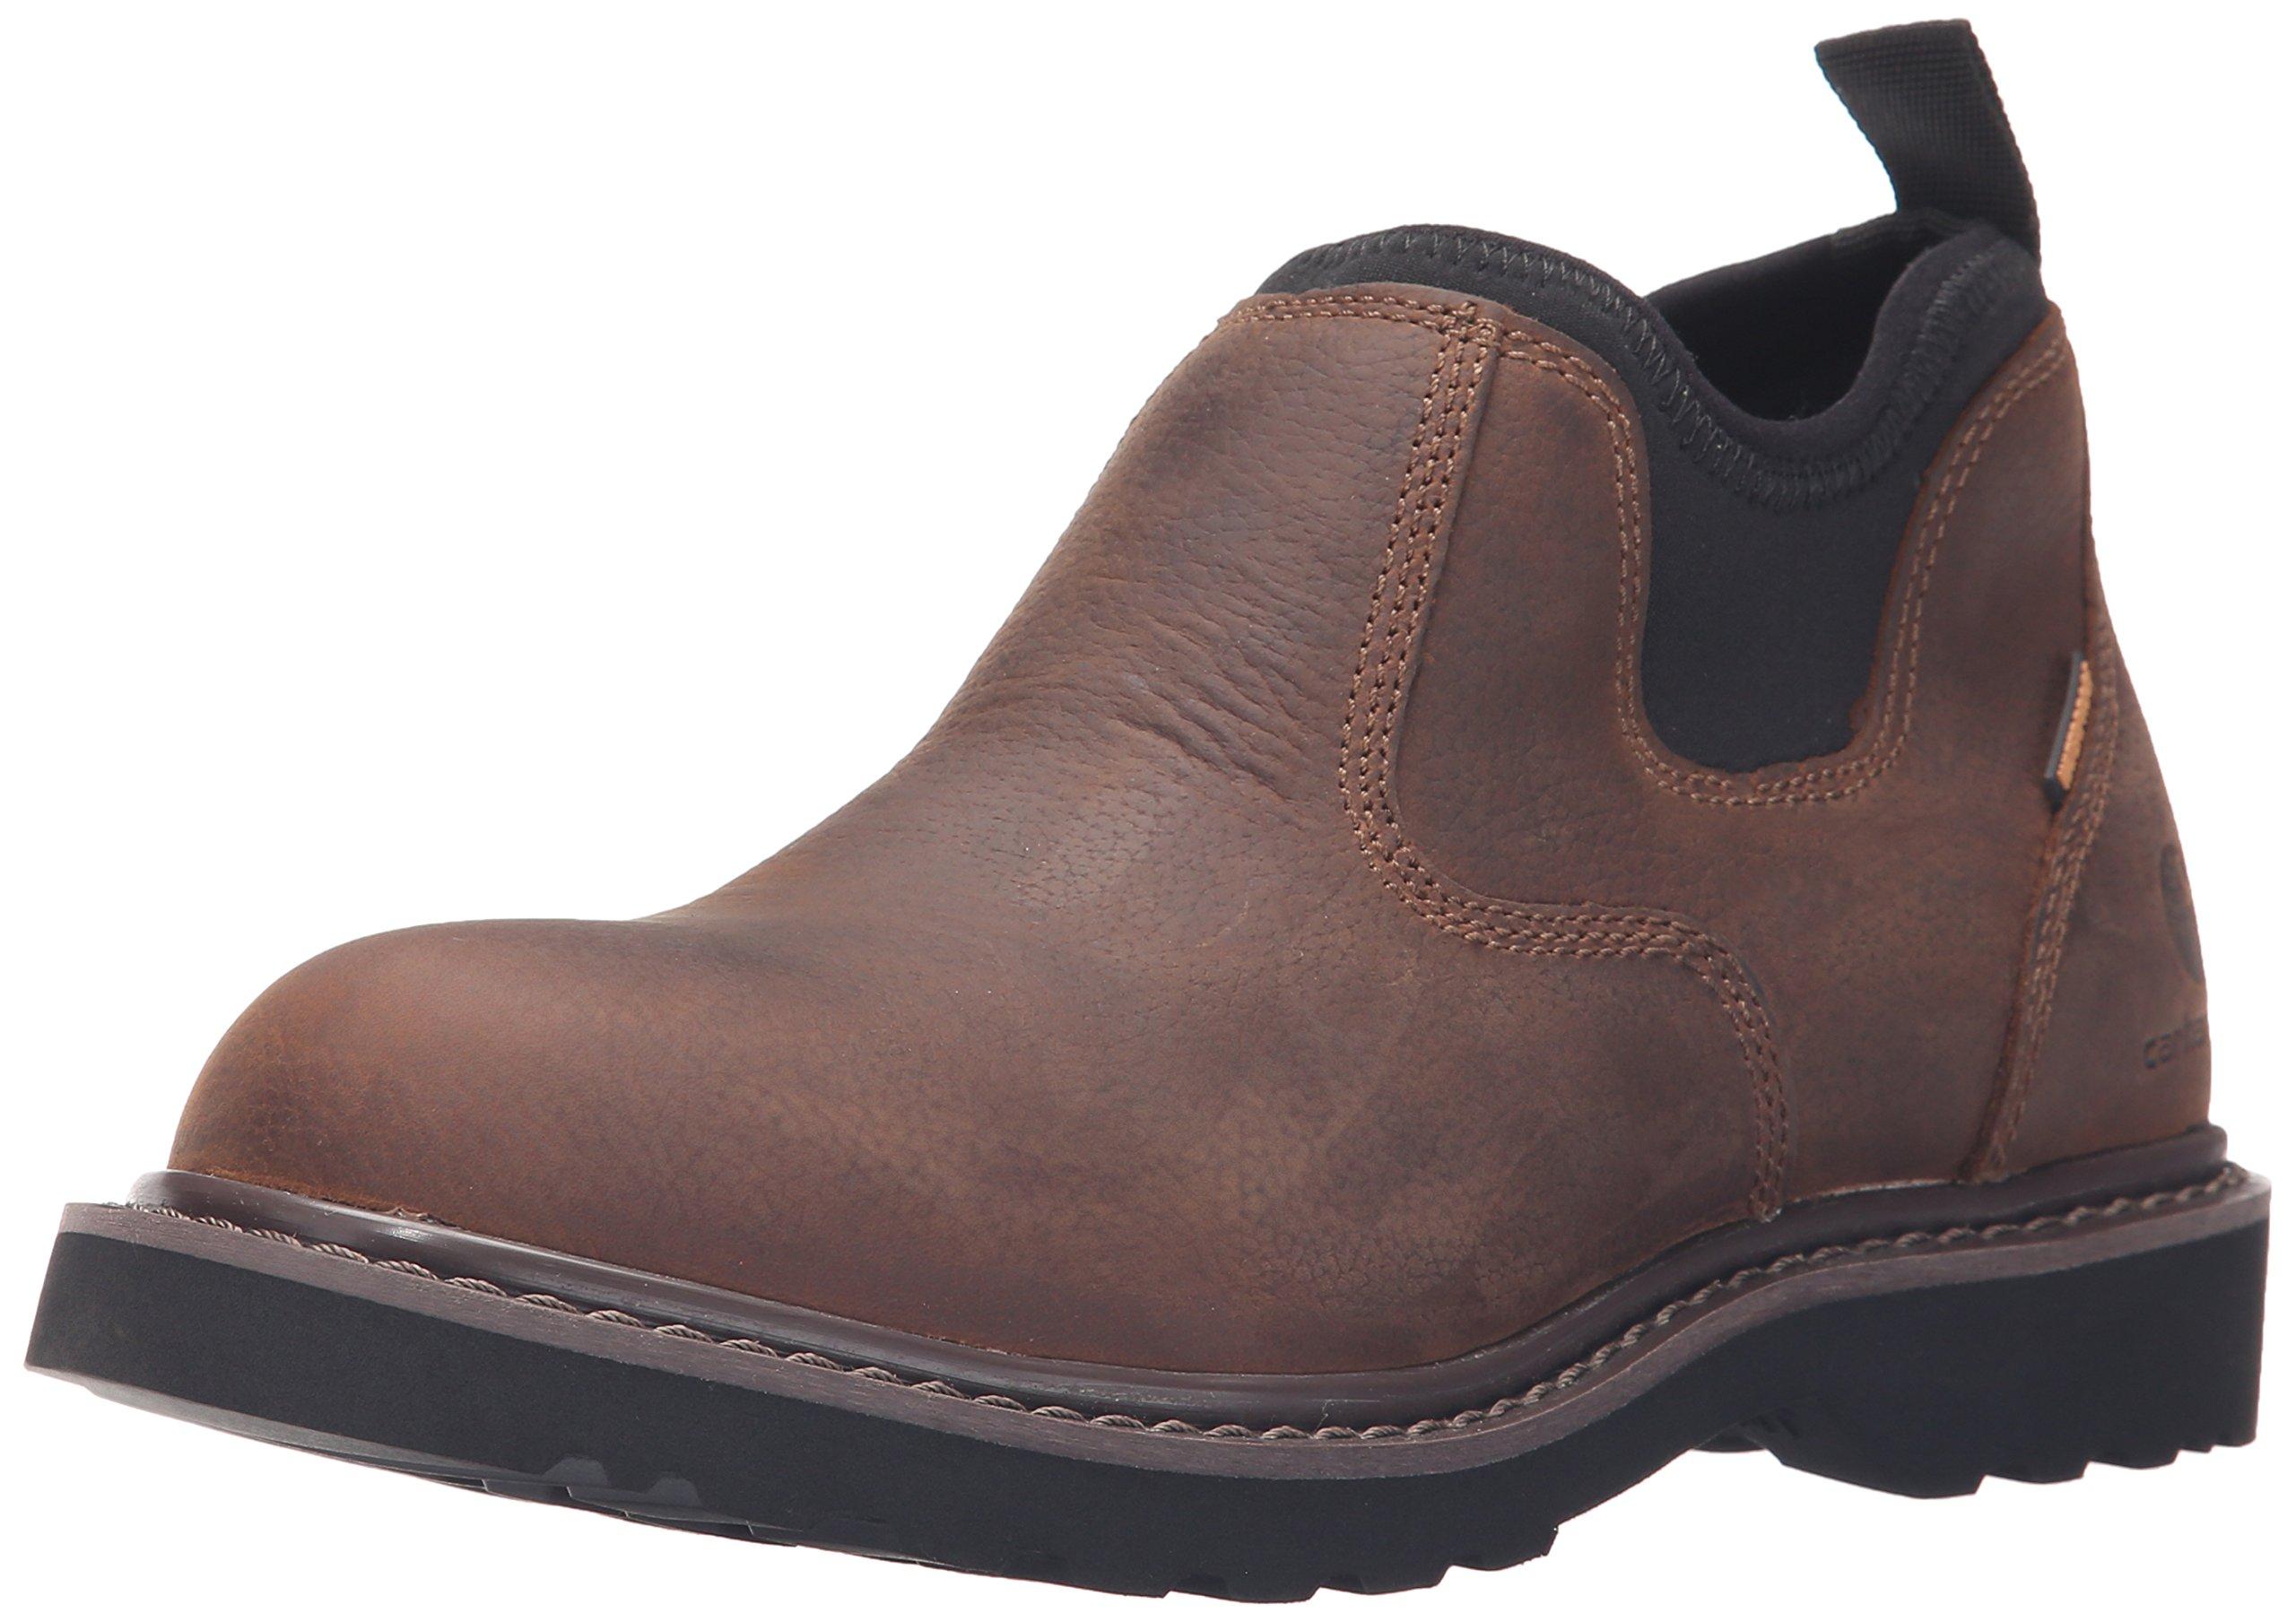 Carhartt Women's 4'' Romeo Waterproof Soft Toe Work Shoe CWS4160, Dark Bison Oil Tanned, 8 M US